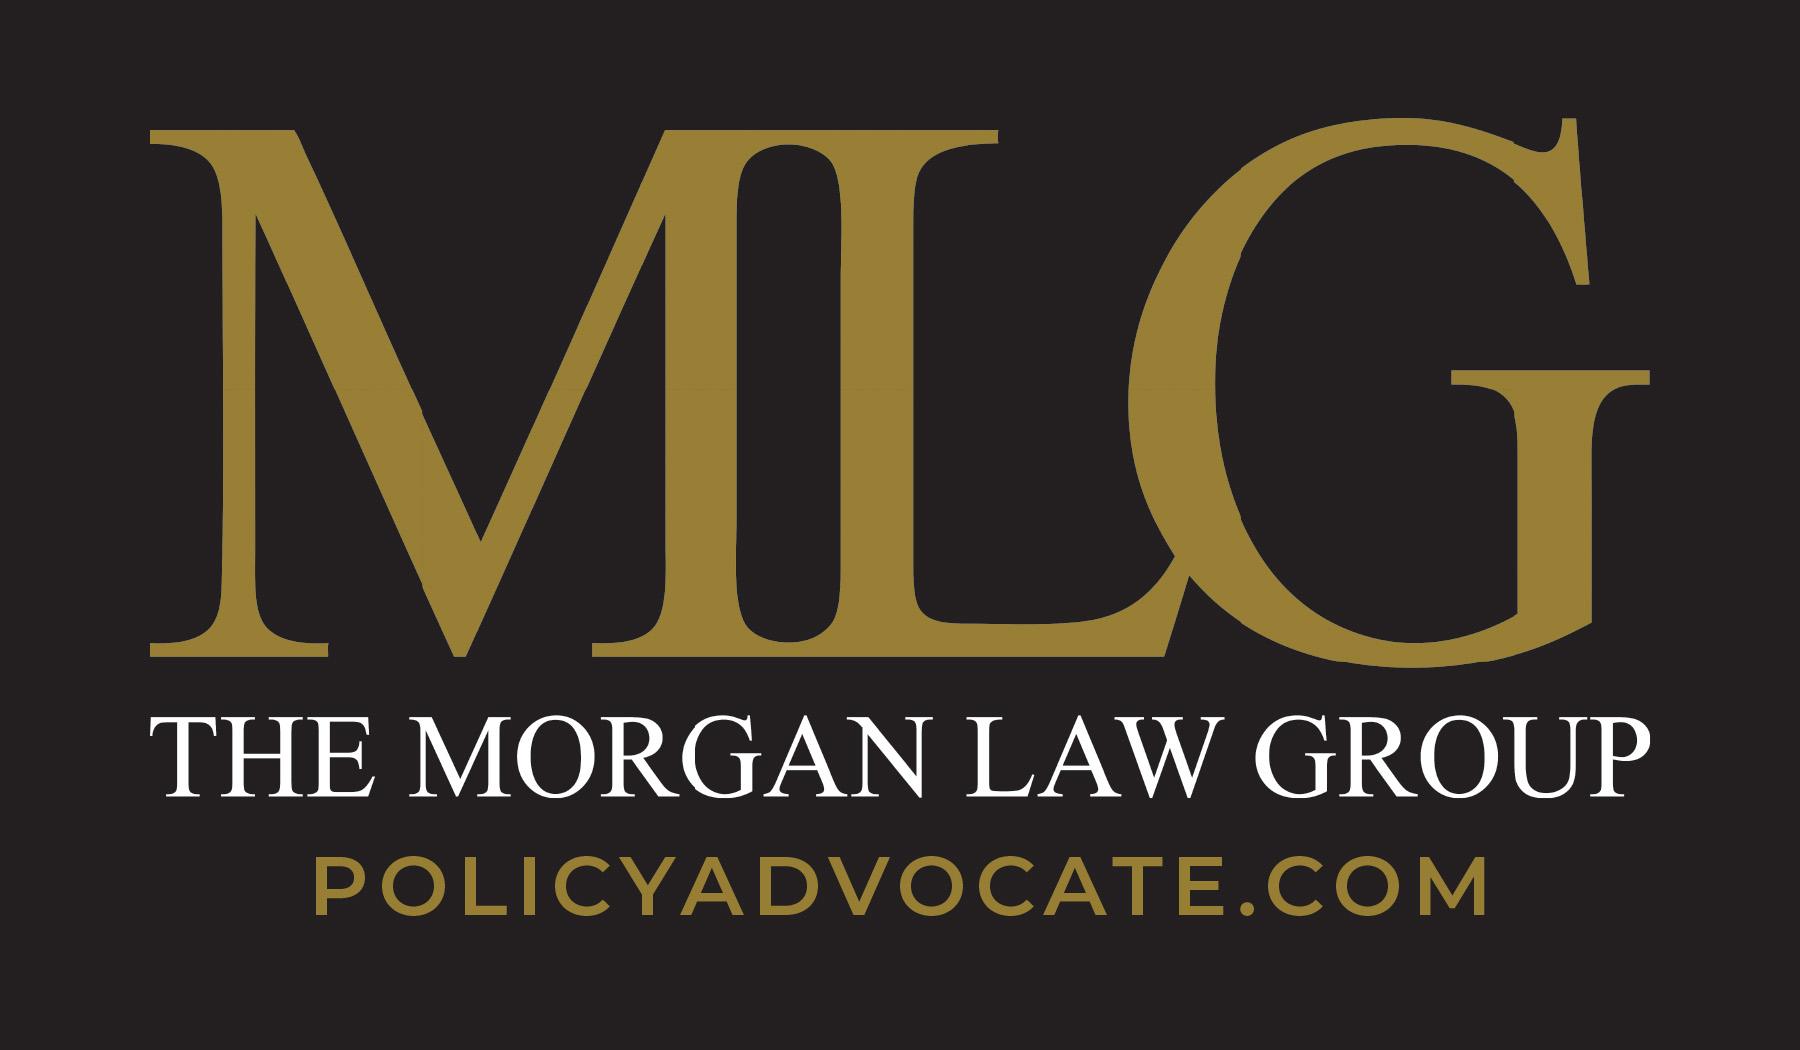 Morgan Law Group